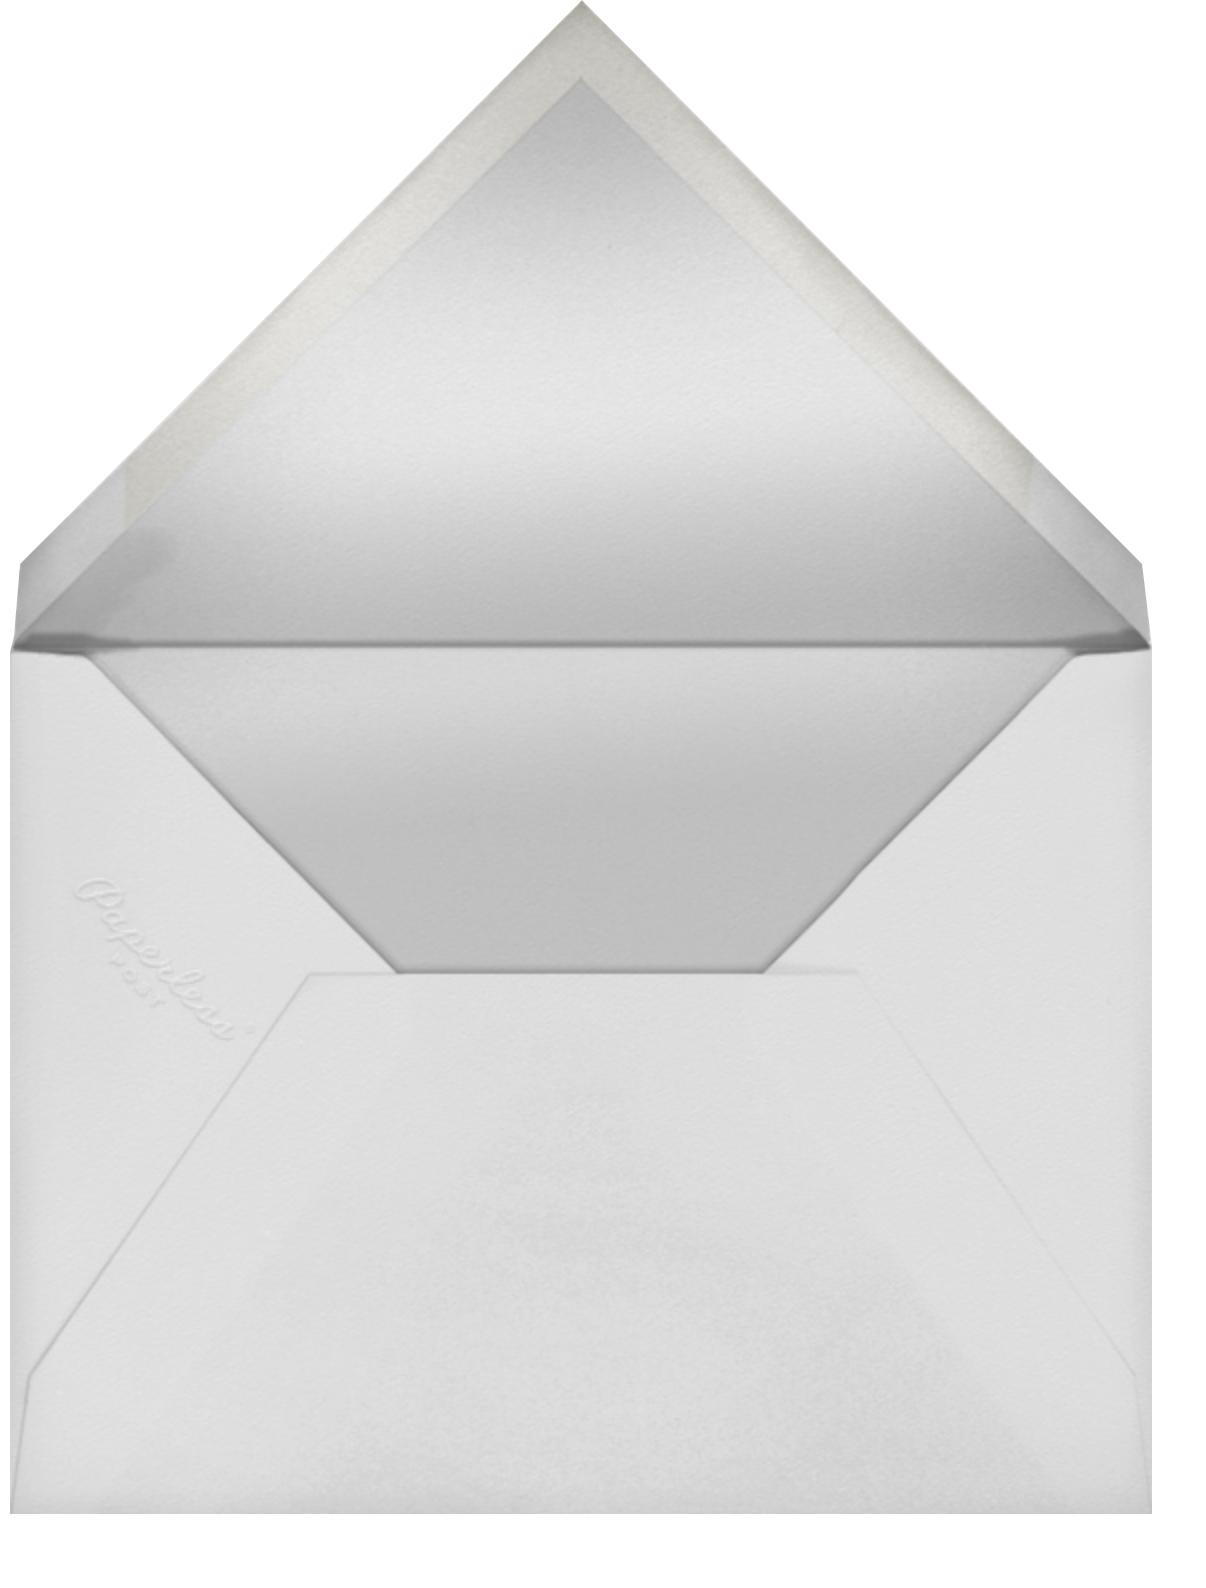 Palmier II (Menu) - Green - Paperless Post - Menus and programs - envelope back